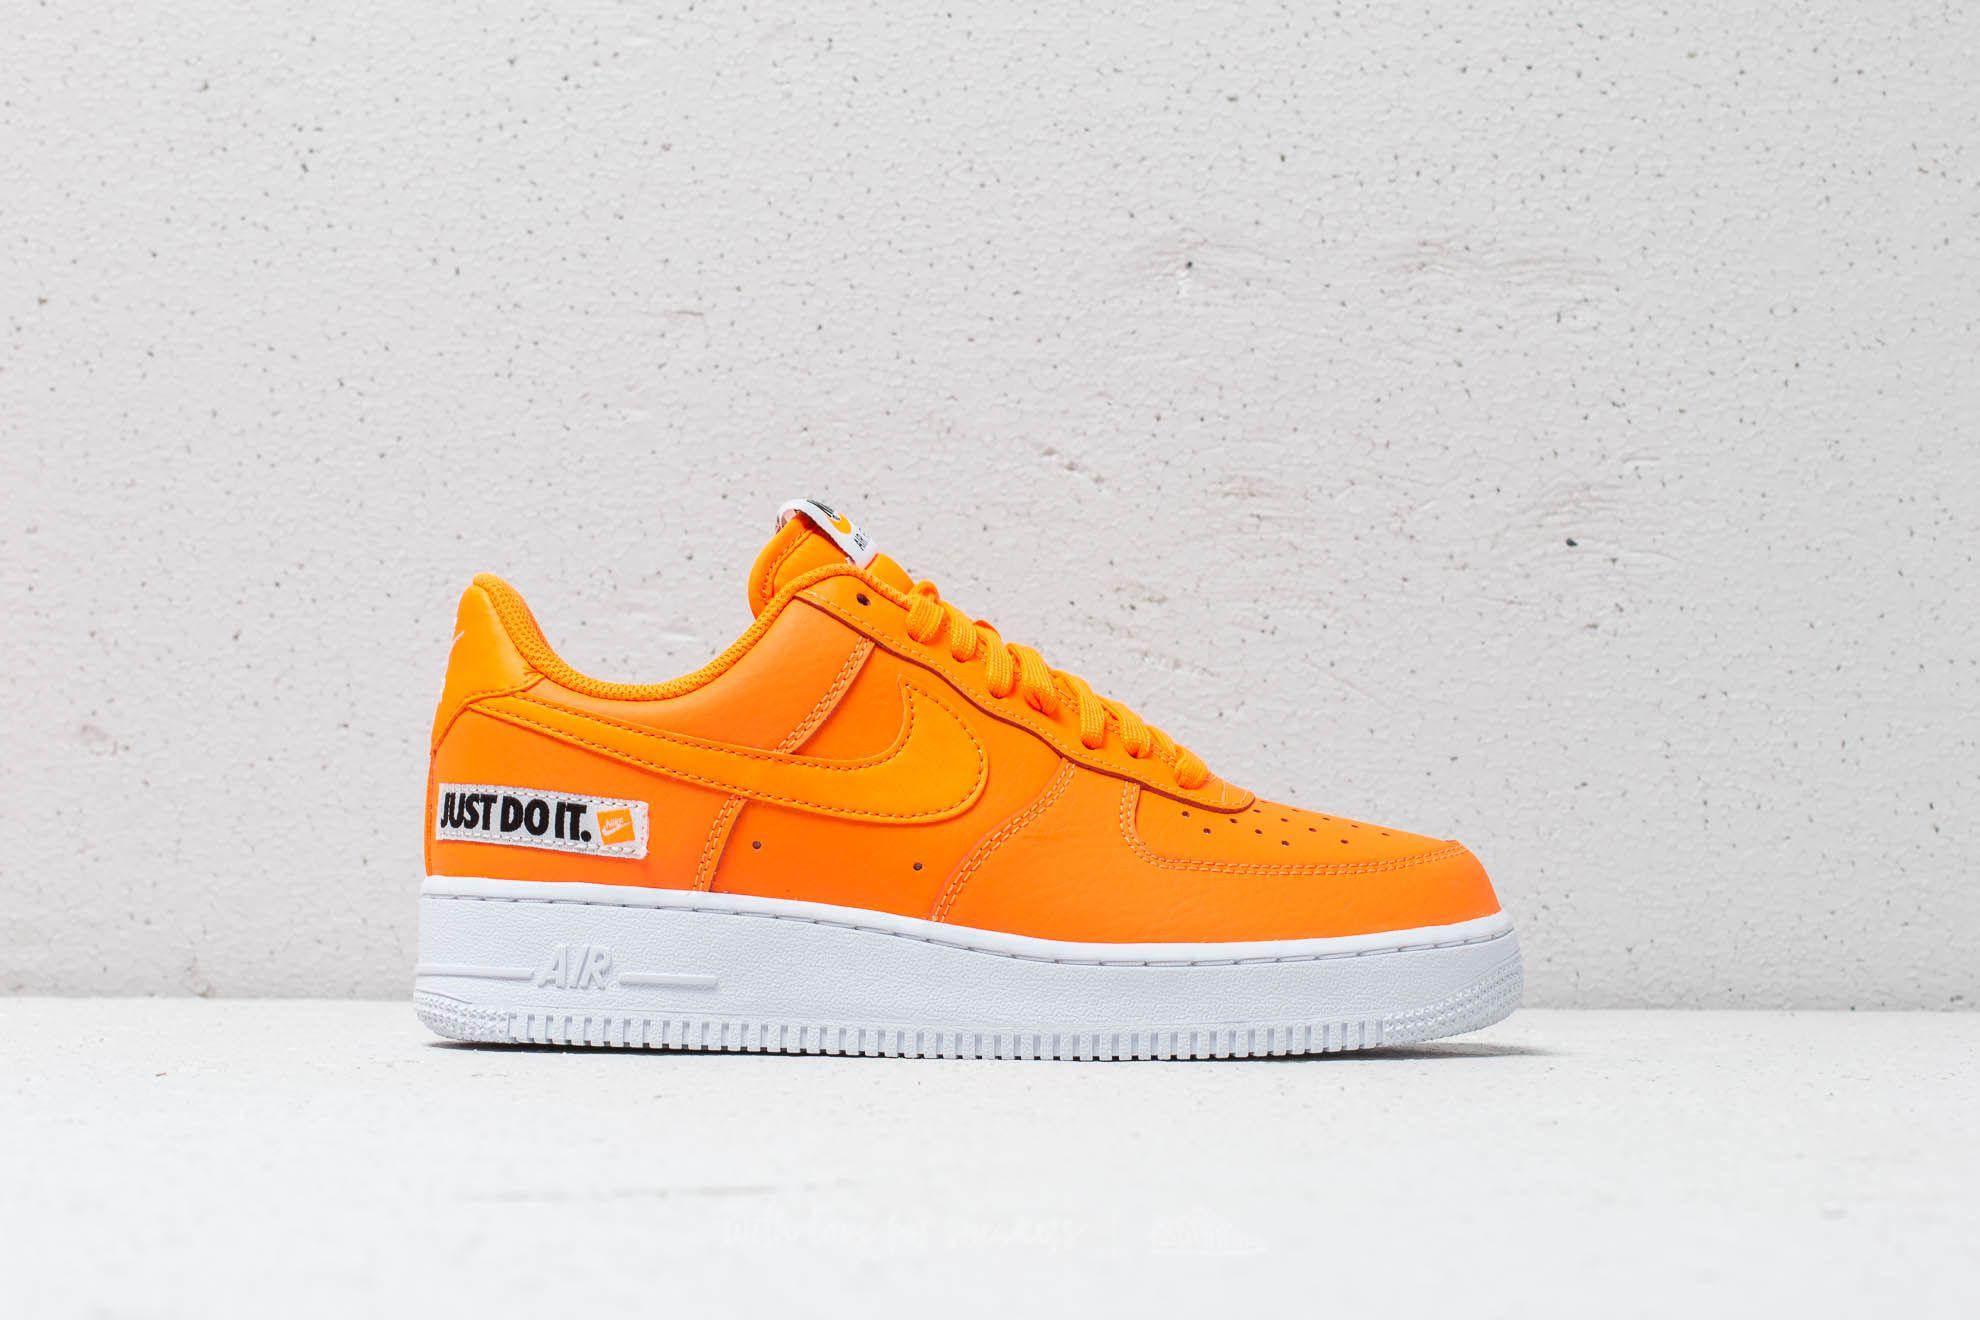 Nike Air Force 1 ´07 LV8 JDI Leather Total Orange Total Orange   Footshop